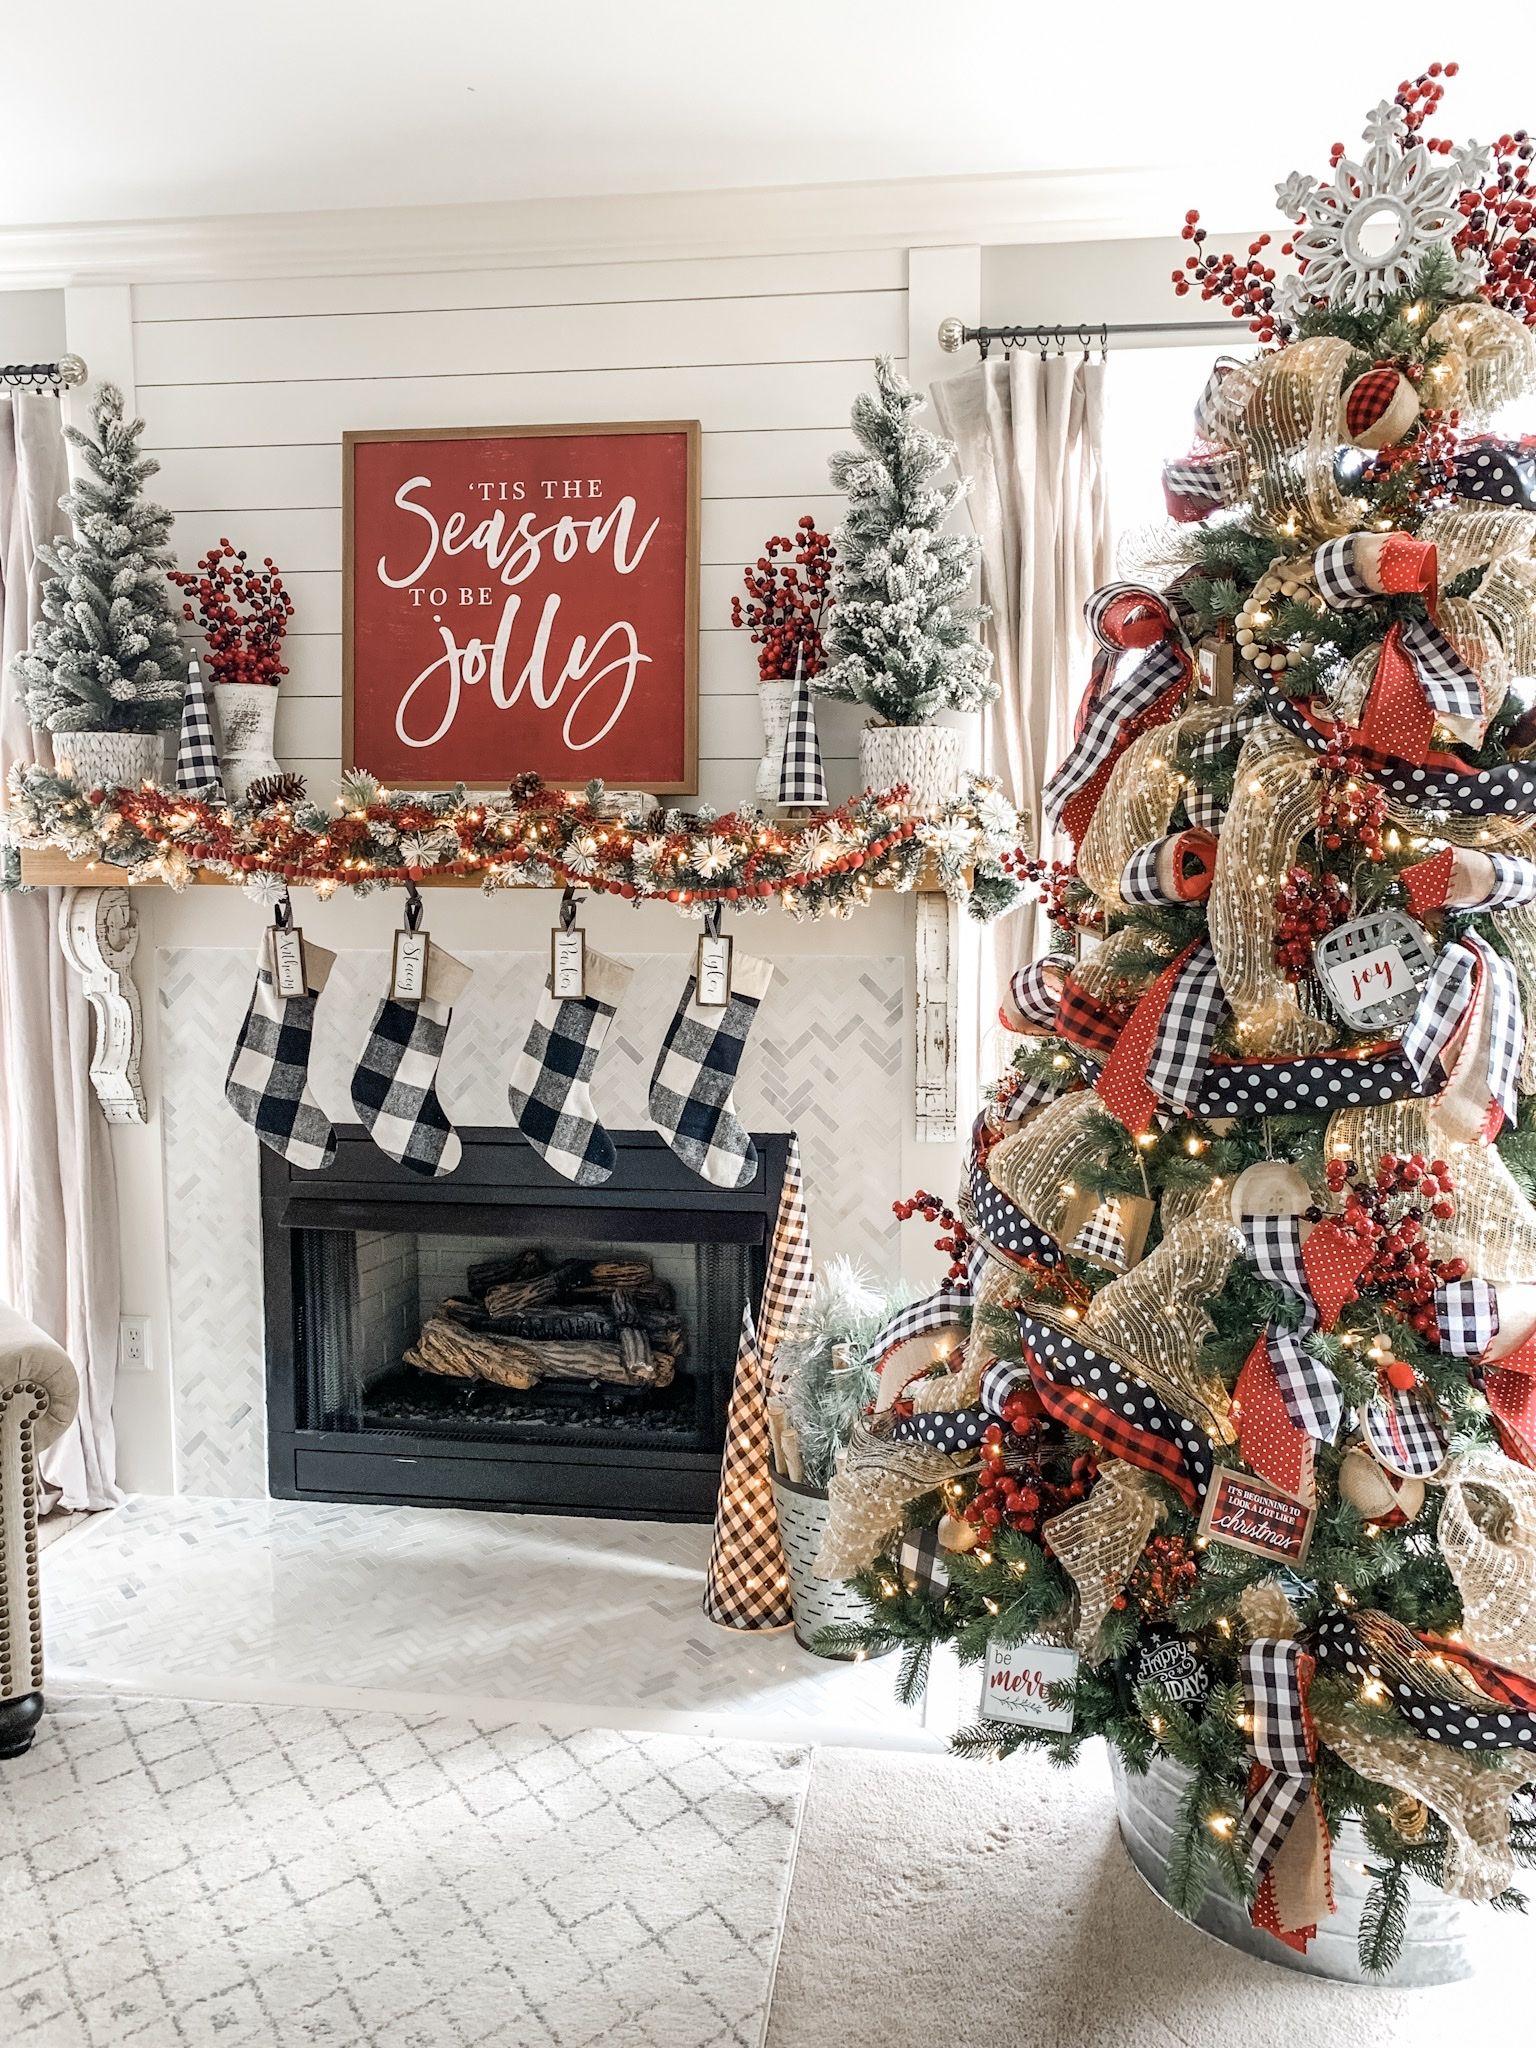 Christmas mantel decor using buffalo check!